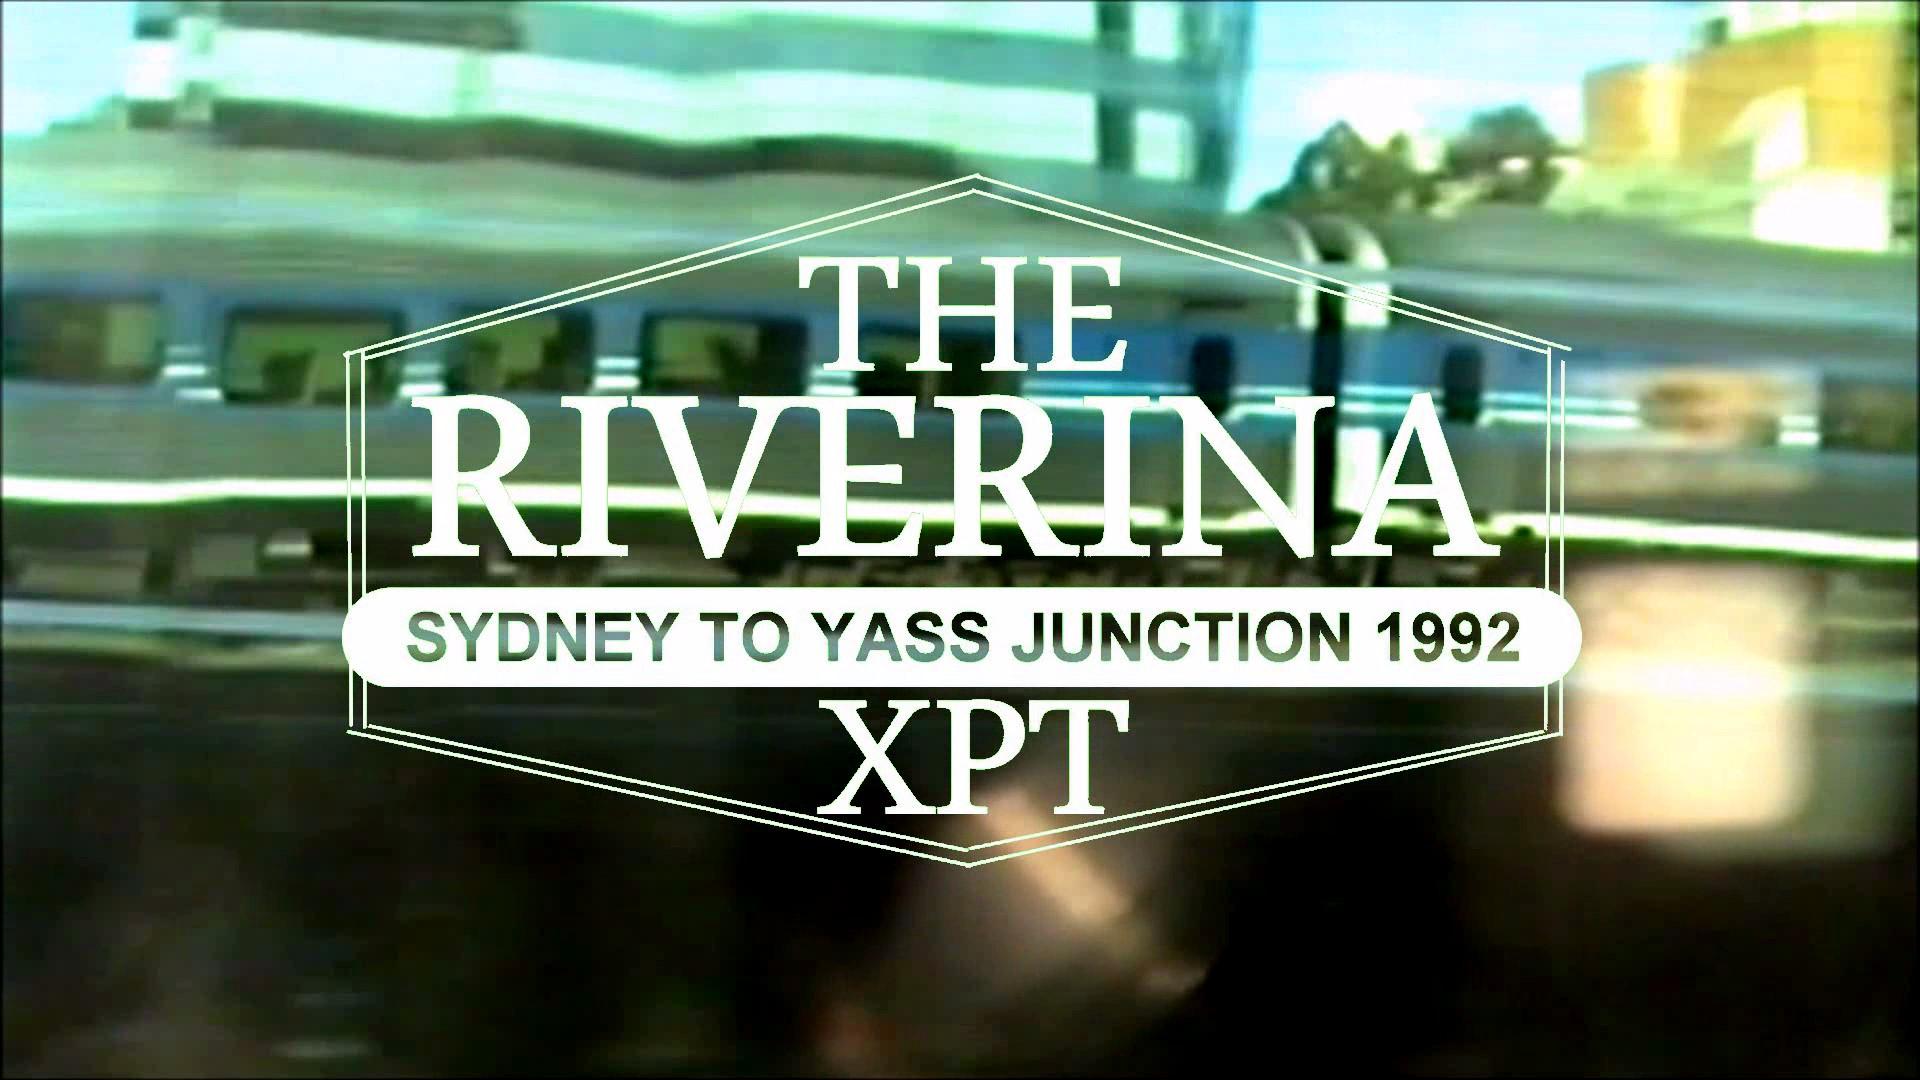 SlowTV  Riverina XPT Train Sydney to Yass Junction NSW Australia